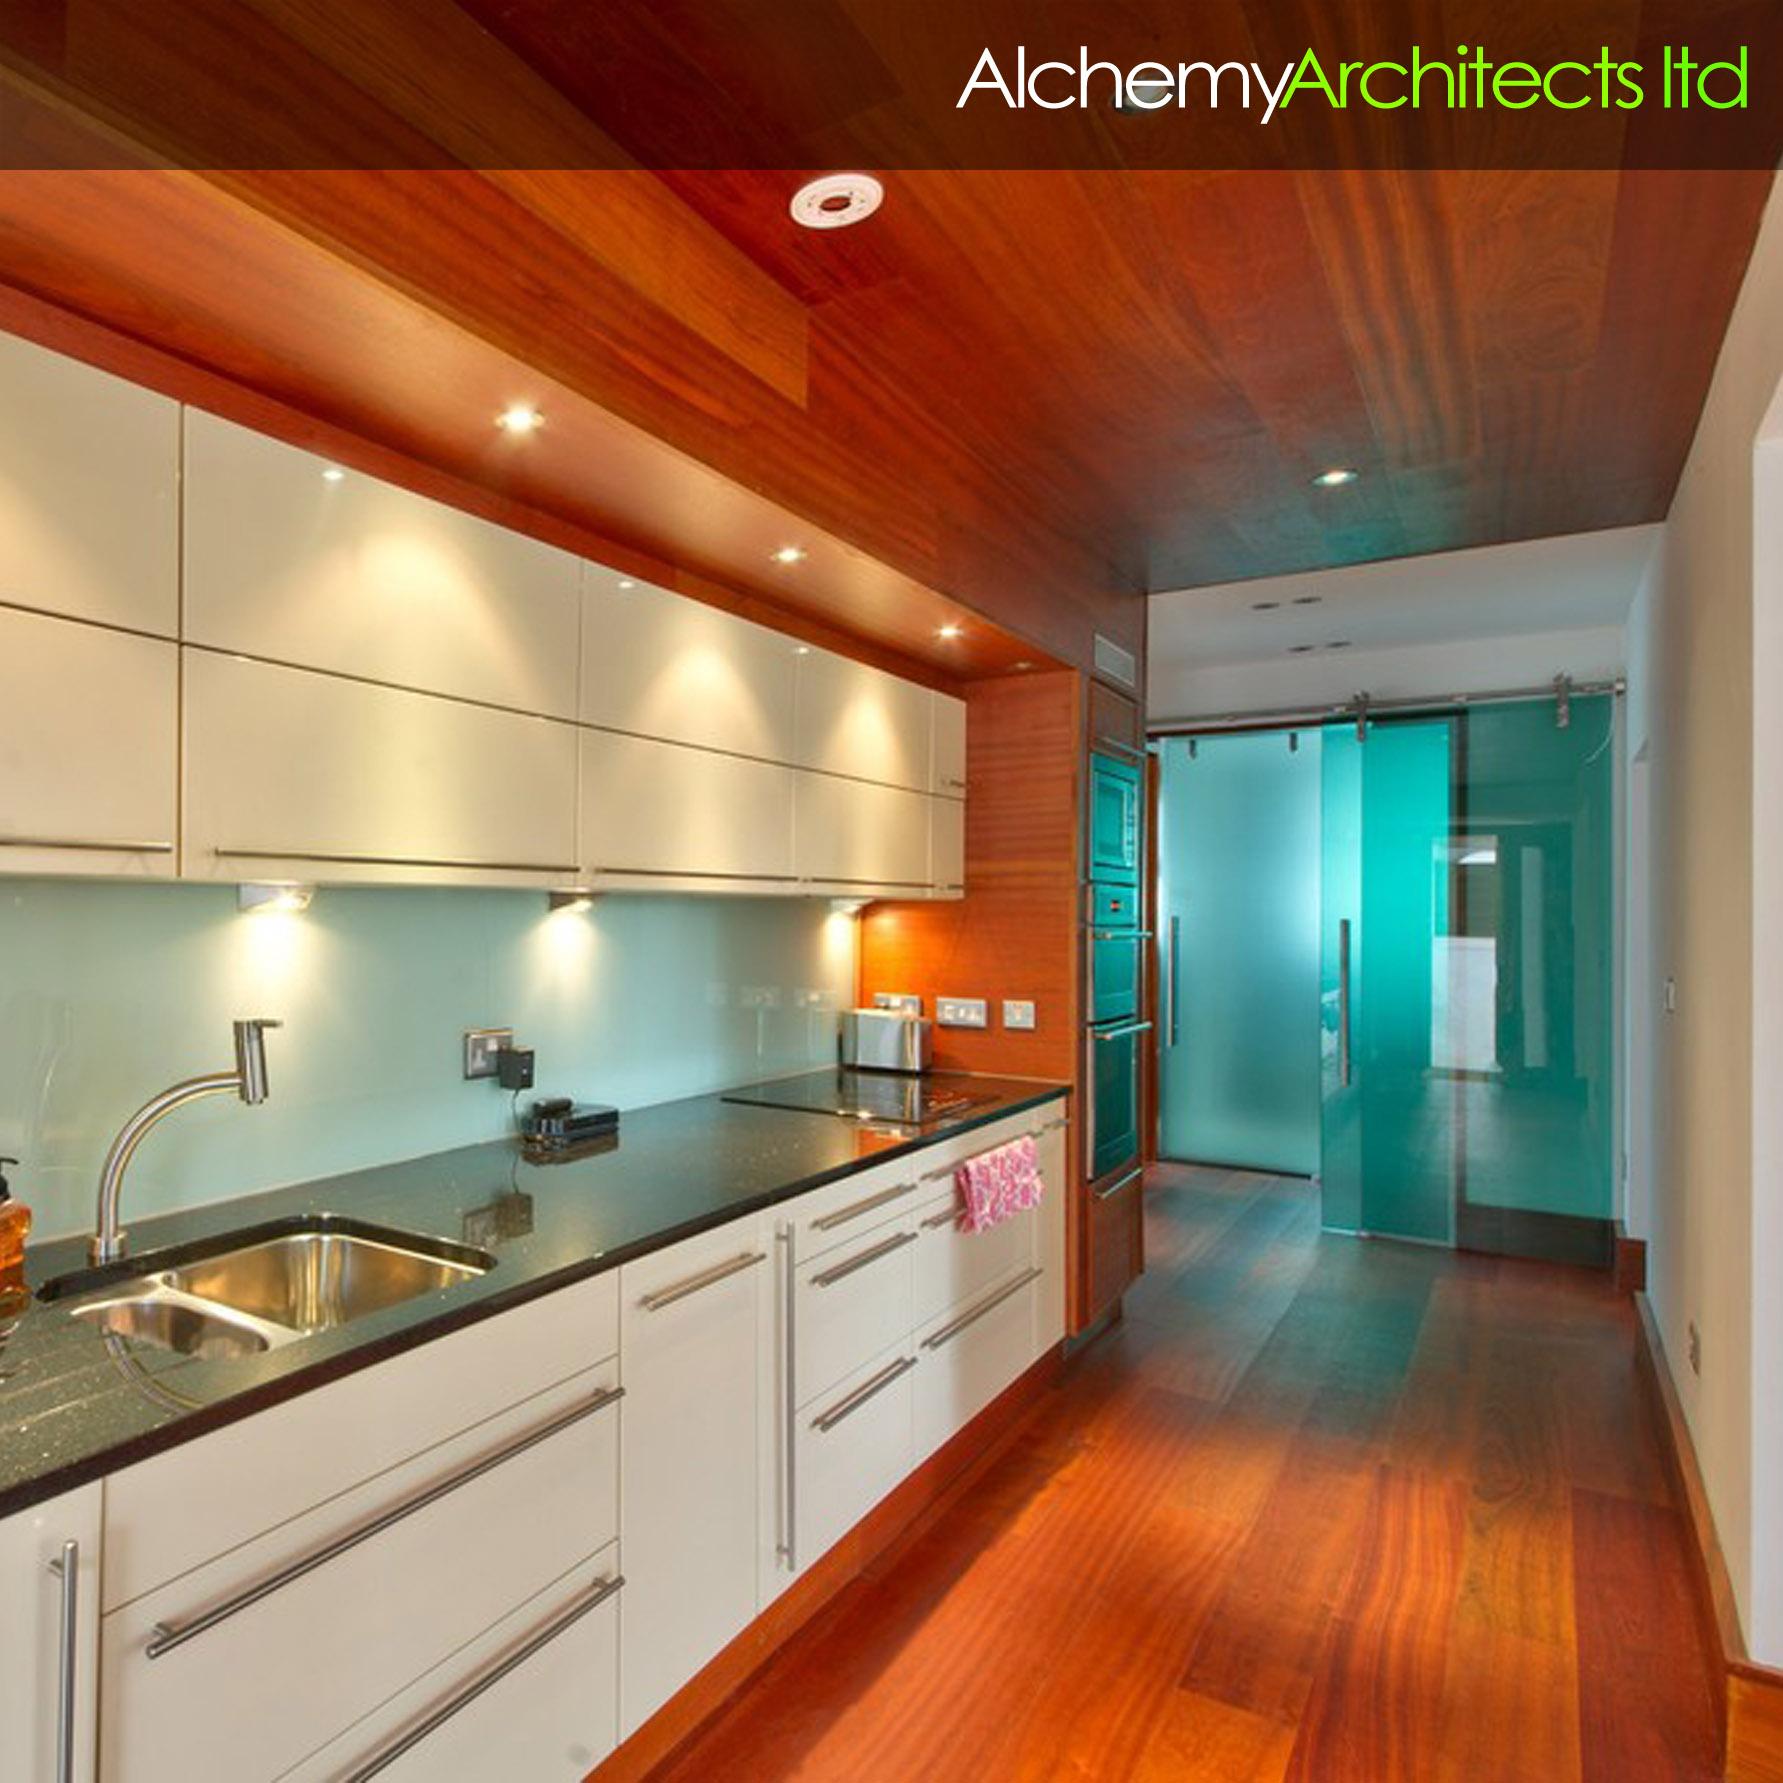 alchemy architects ltd contemporary interior.jpg